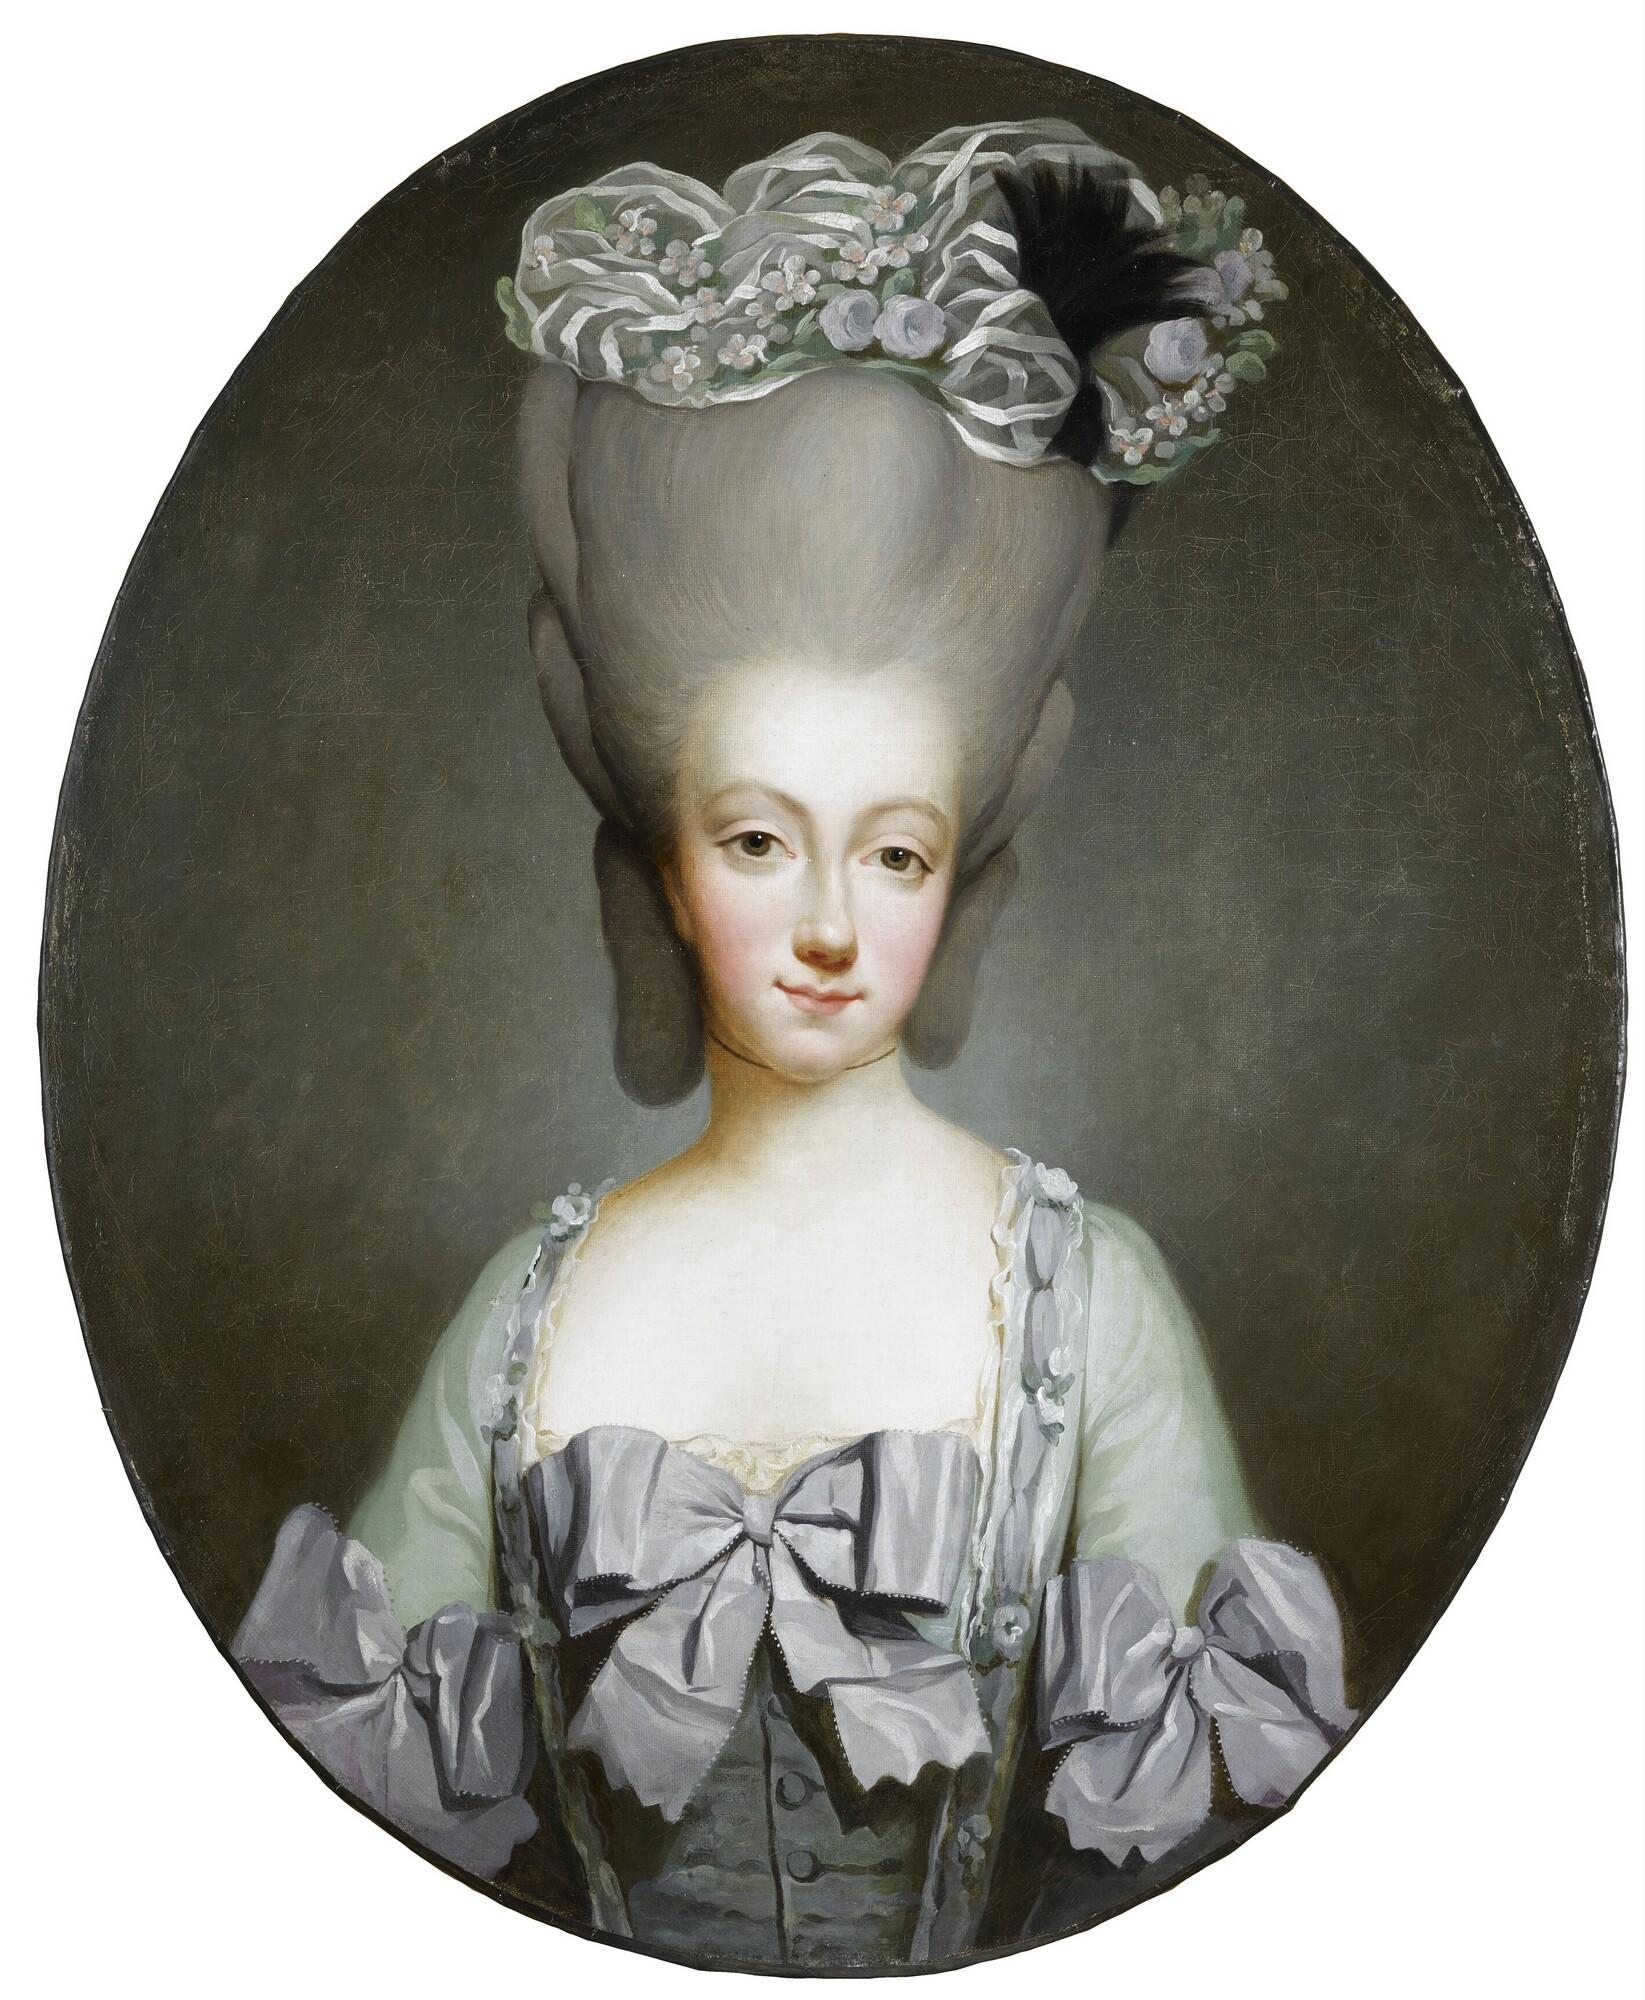 Countess of Artois